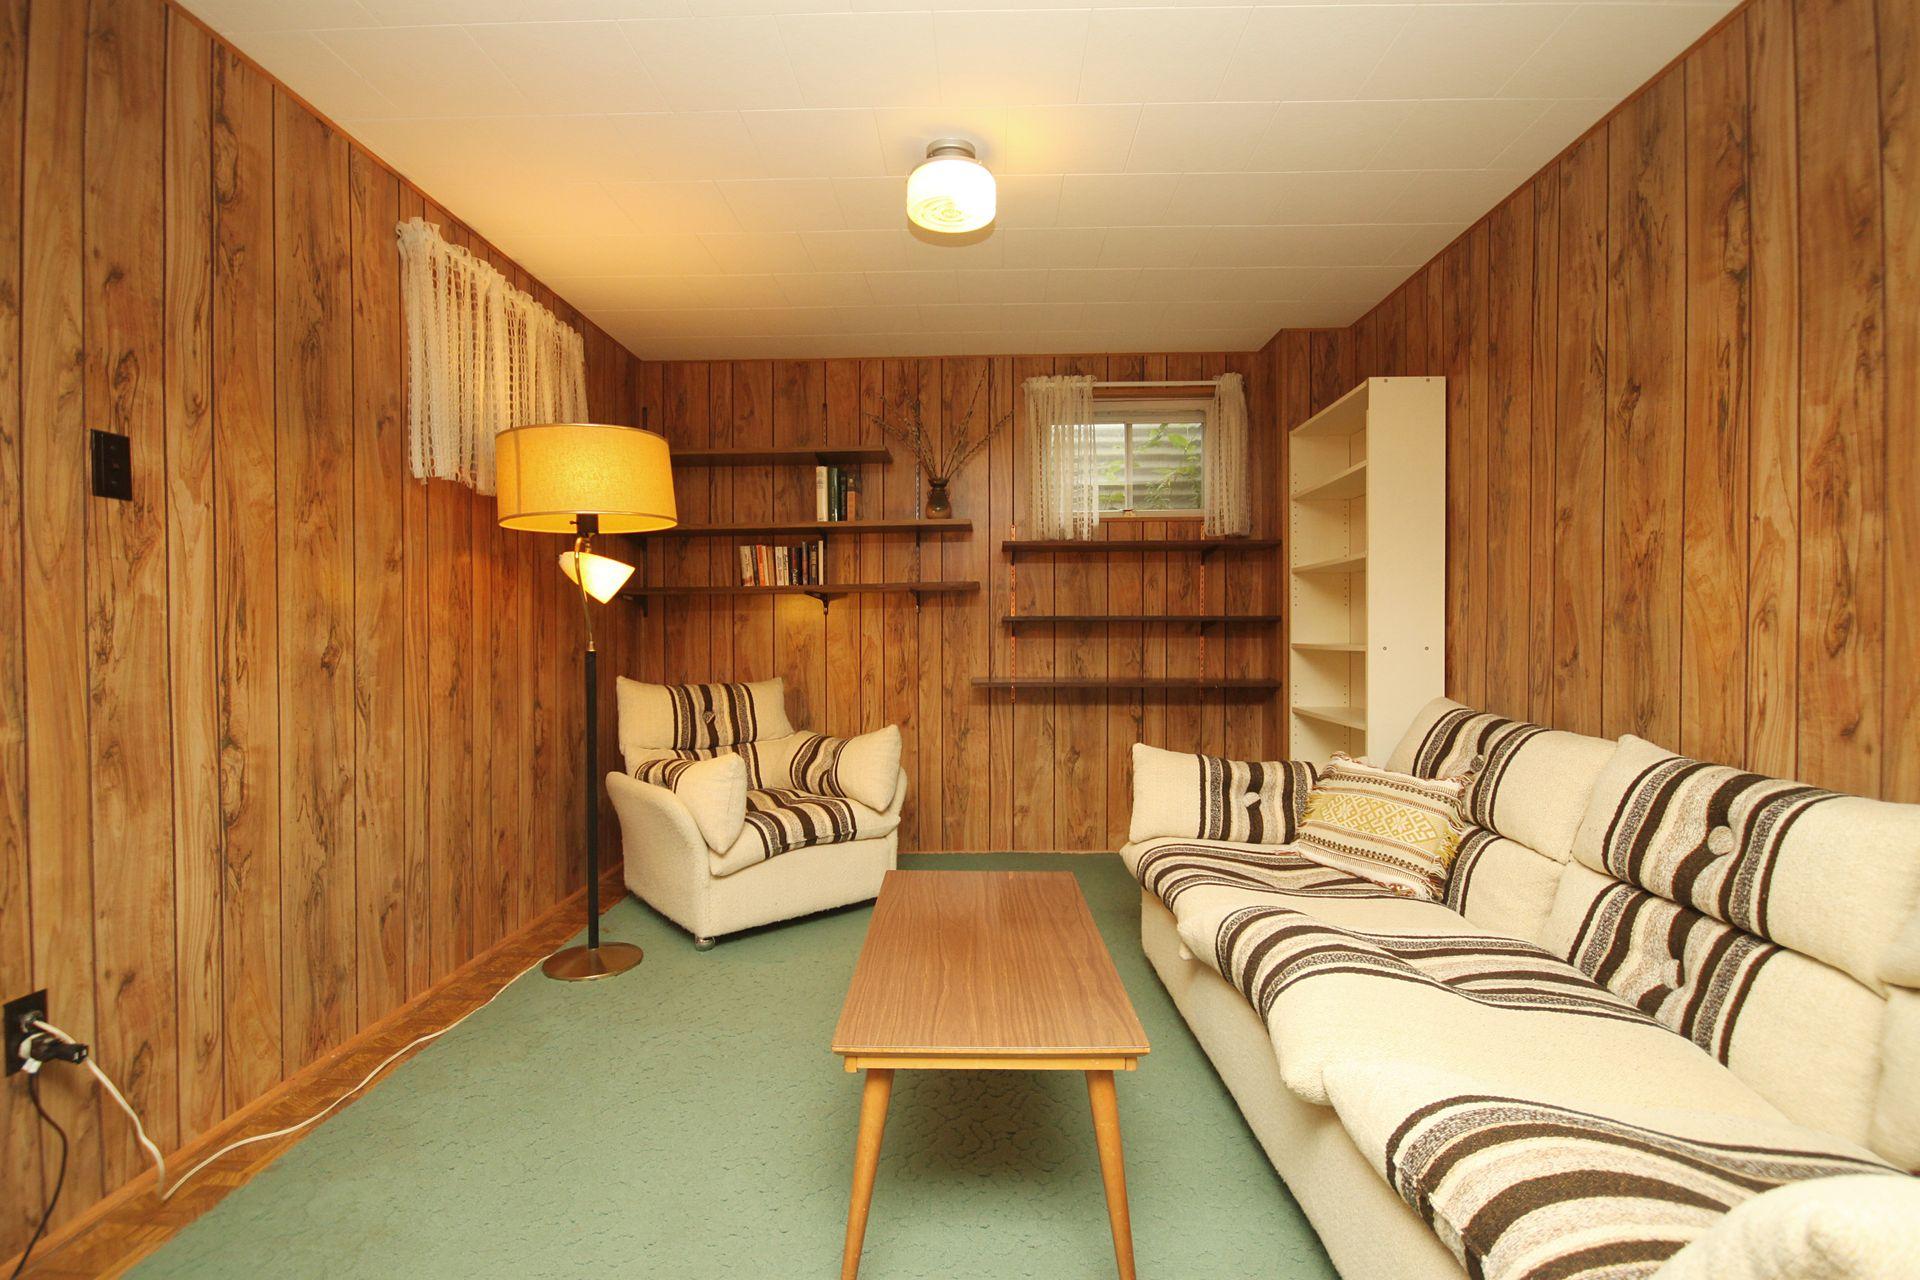 Media Room at 9 Deerpath Road, Parkwoods-Donalda, Toronto